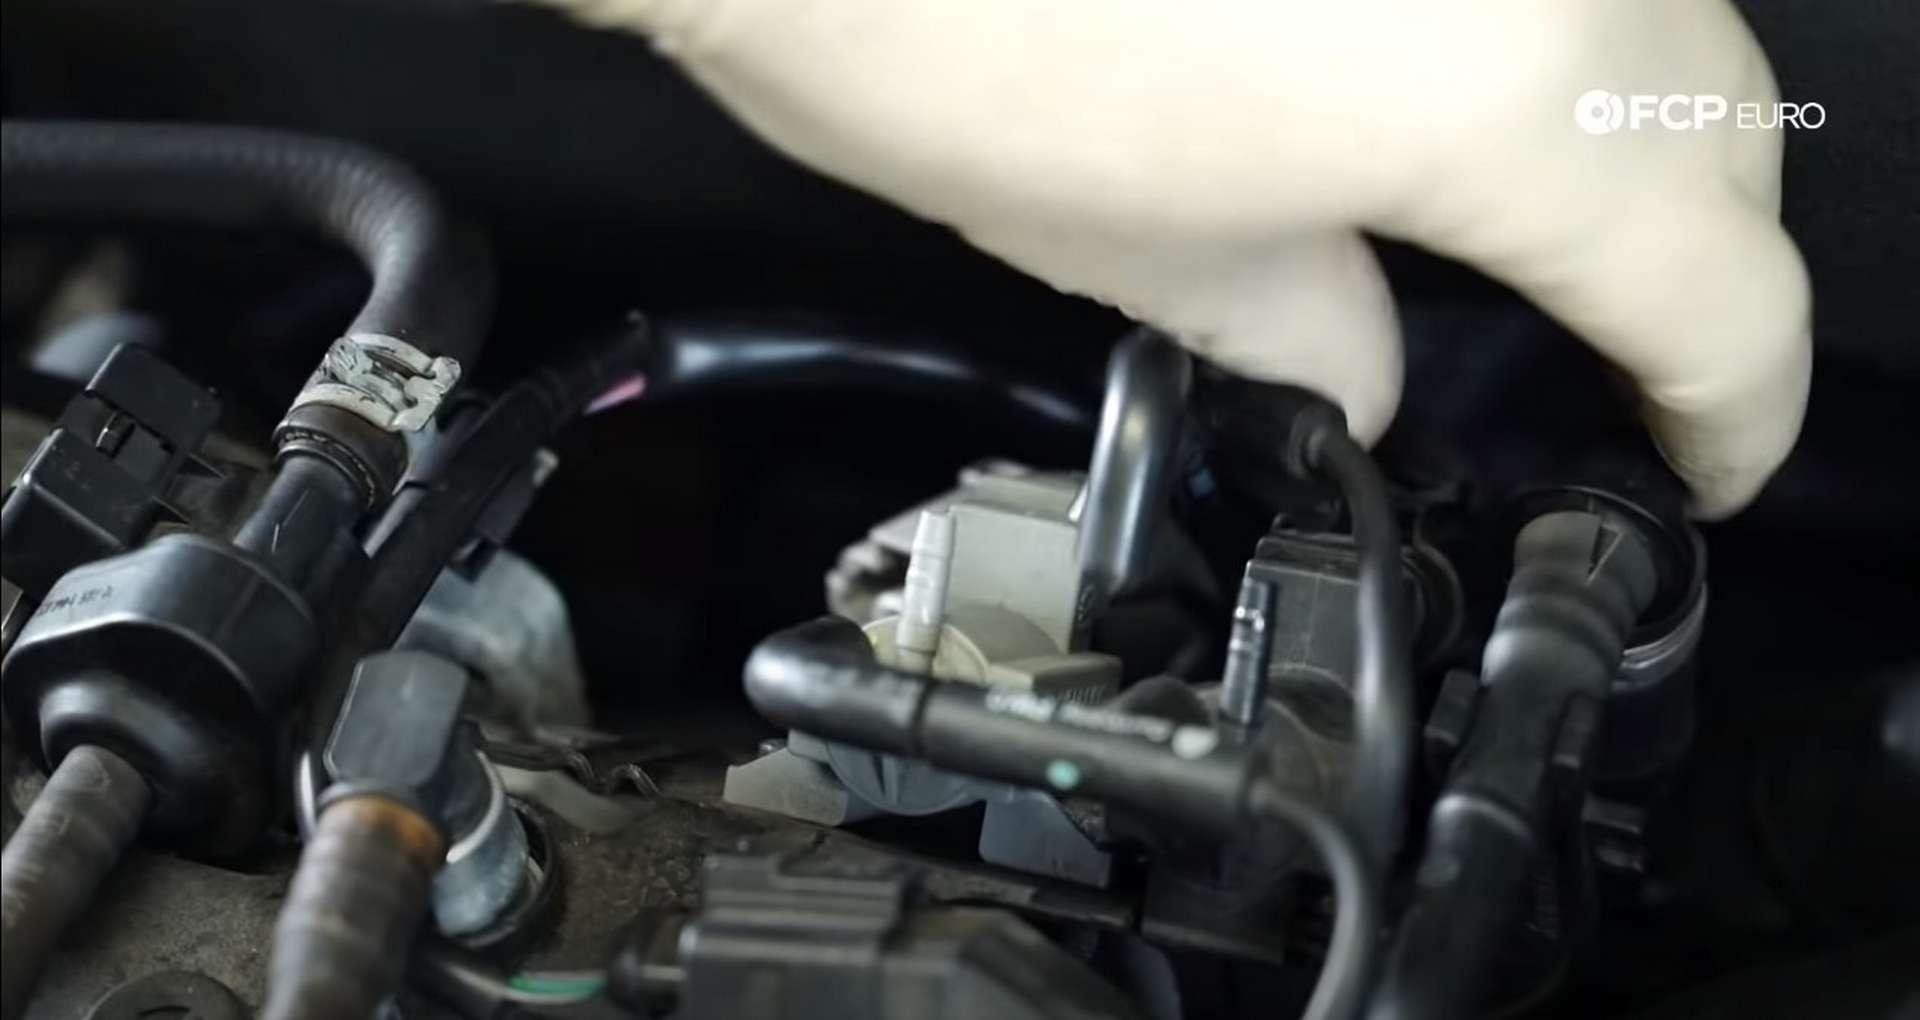 DIY Audi 3.0t Walnut Blasting Intake Valves disconnecting vacuum lines